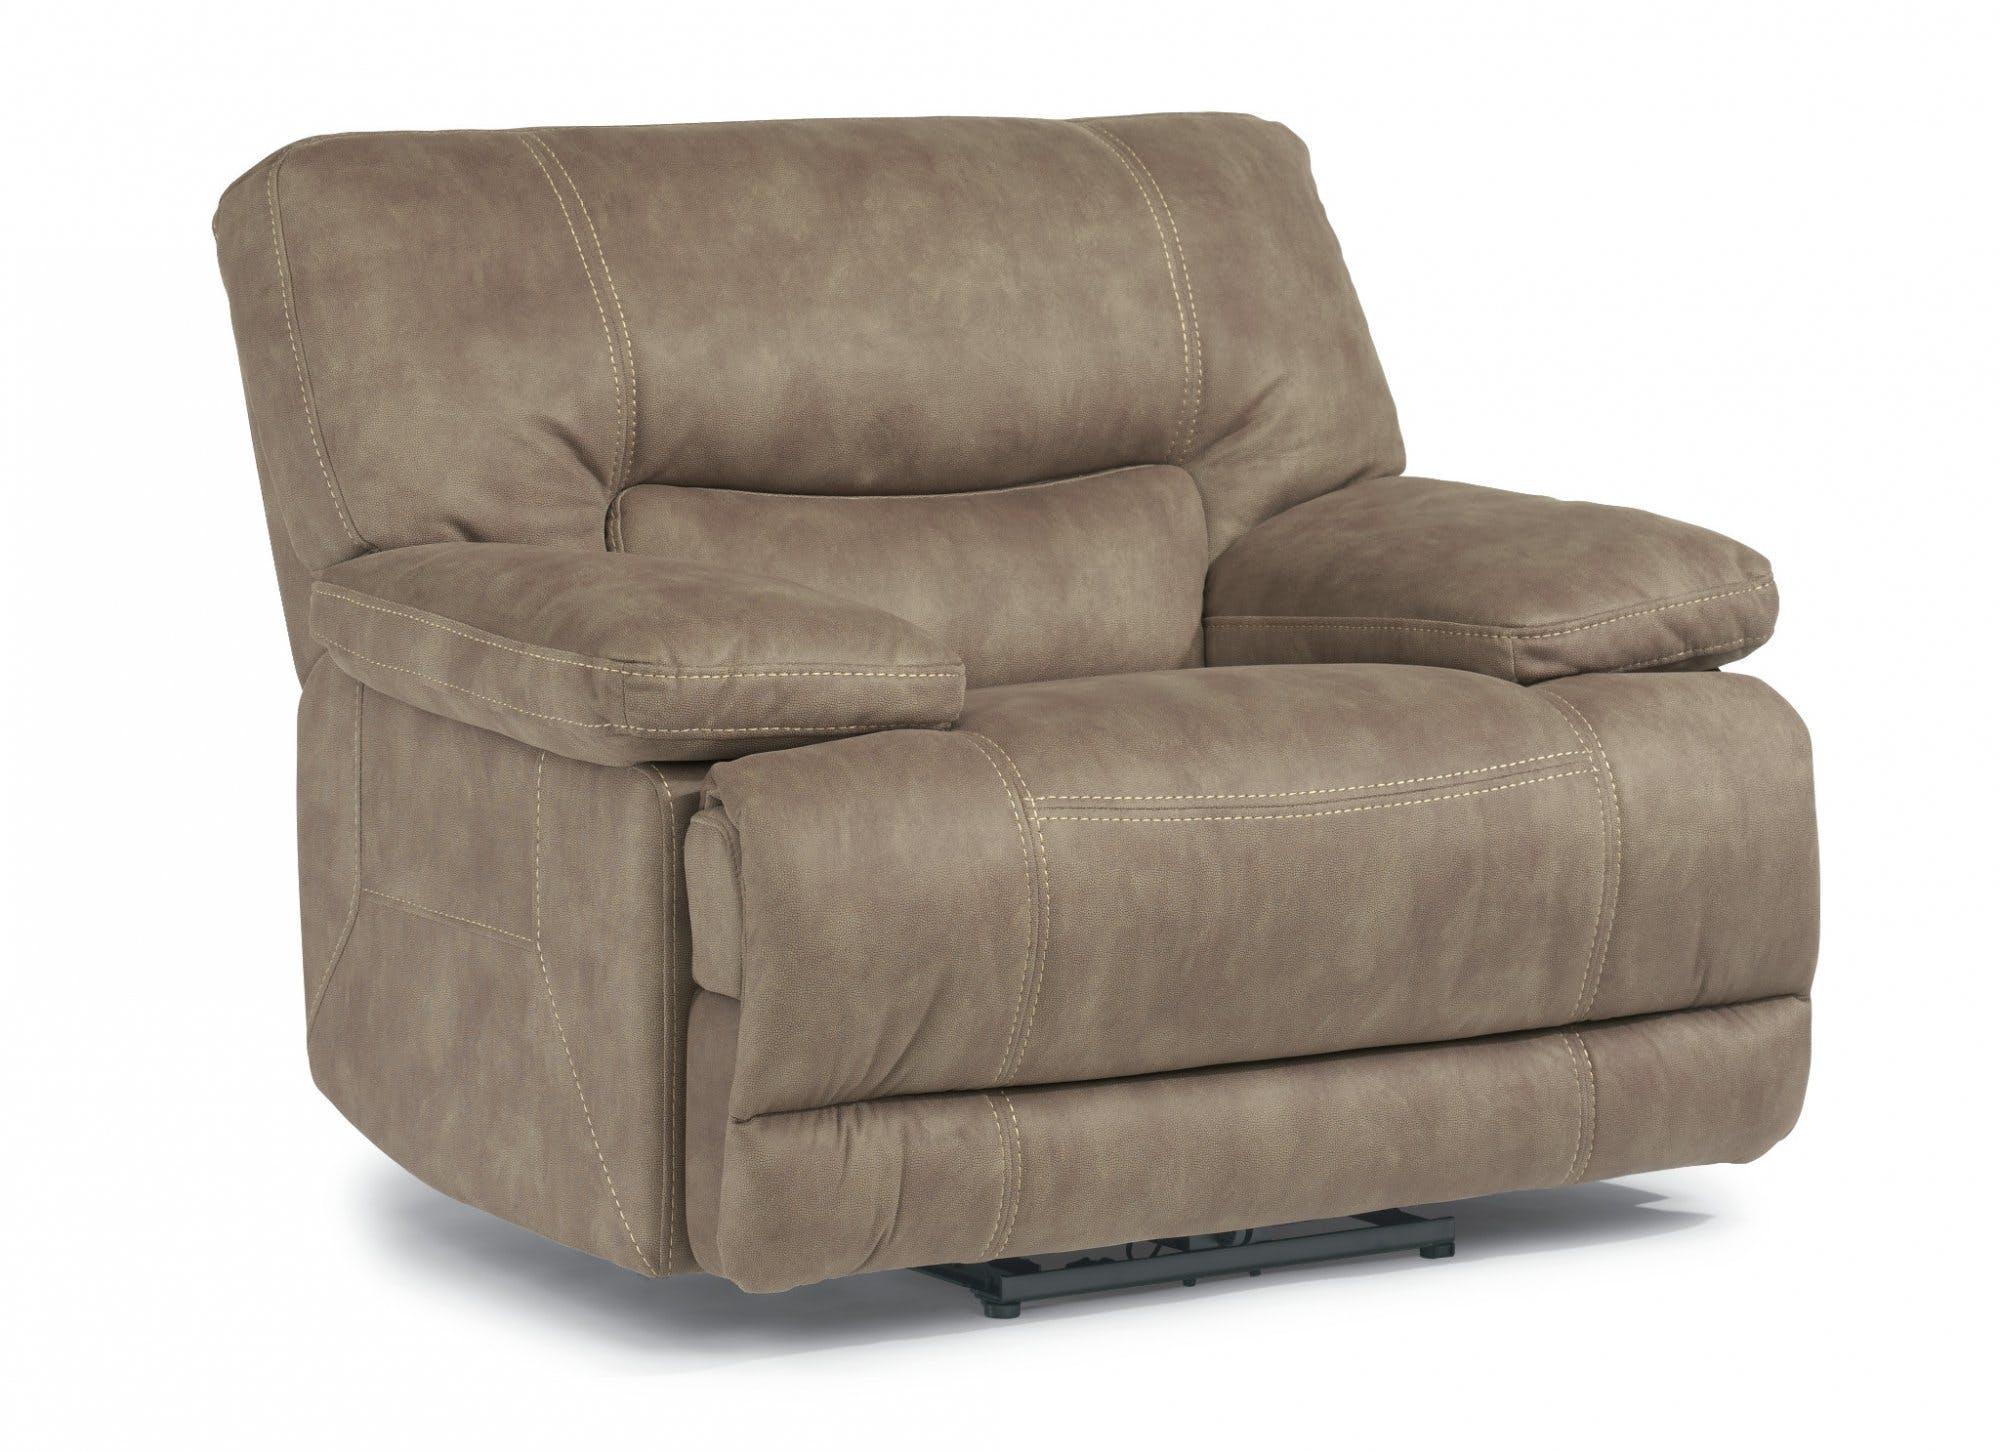 Flexsteel Living Room Fabric Power Recliner 1458-50P - Carol House